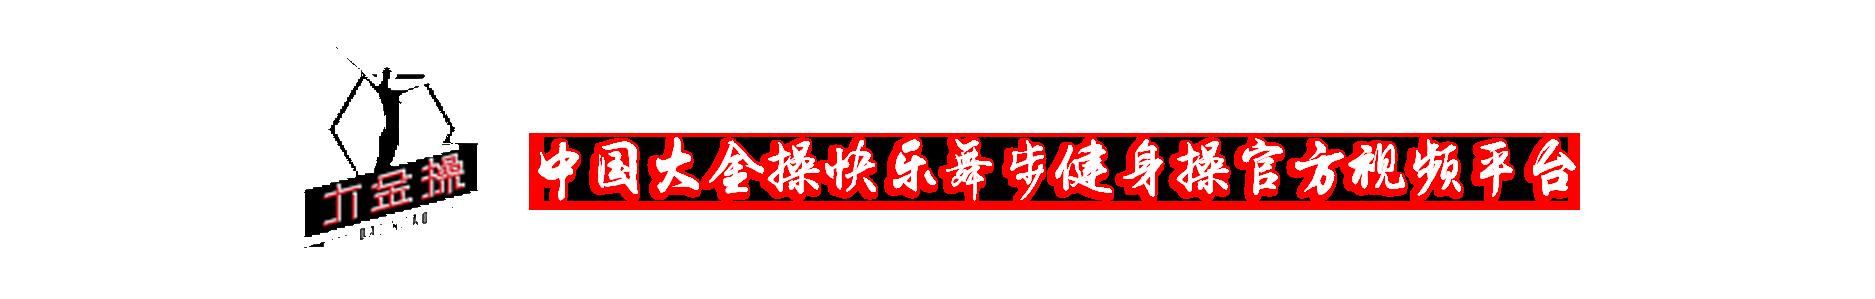 大金操摄制组 banner